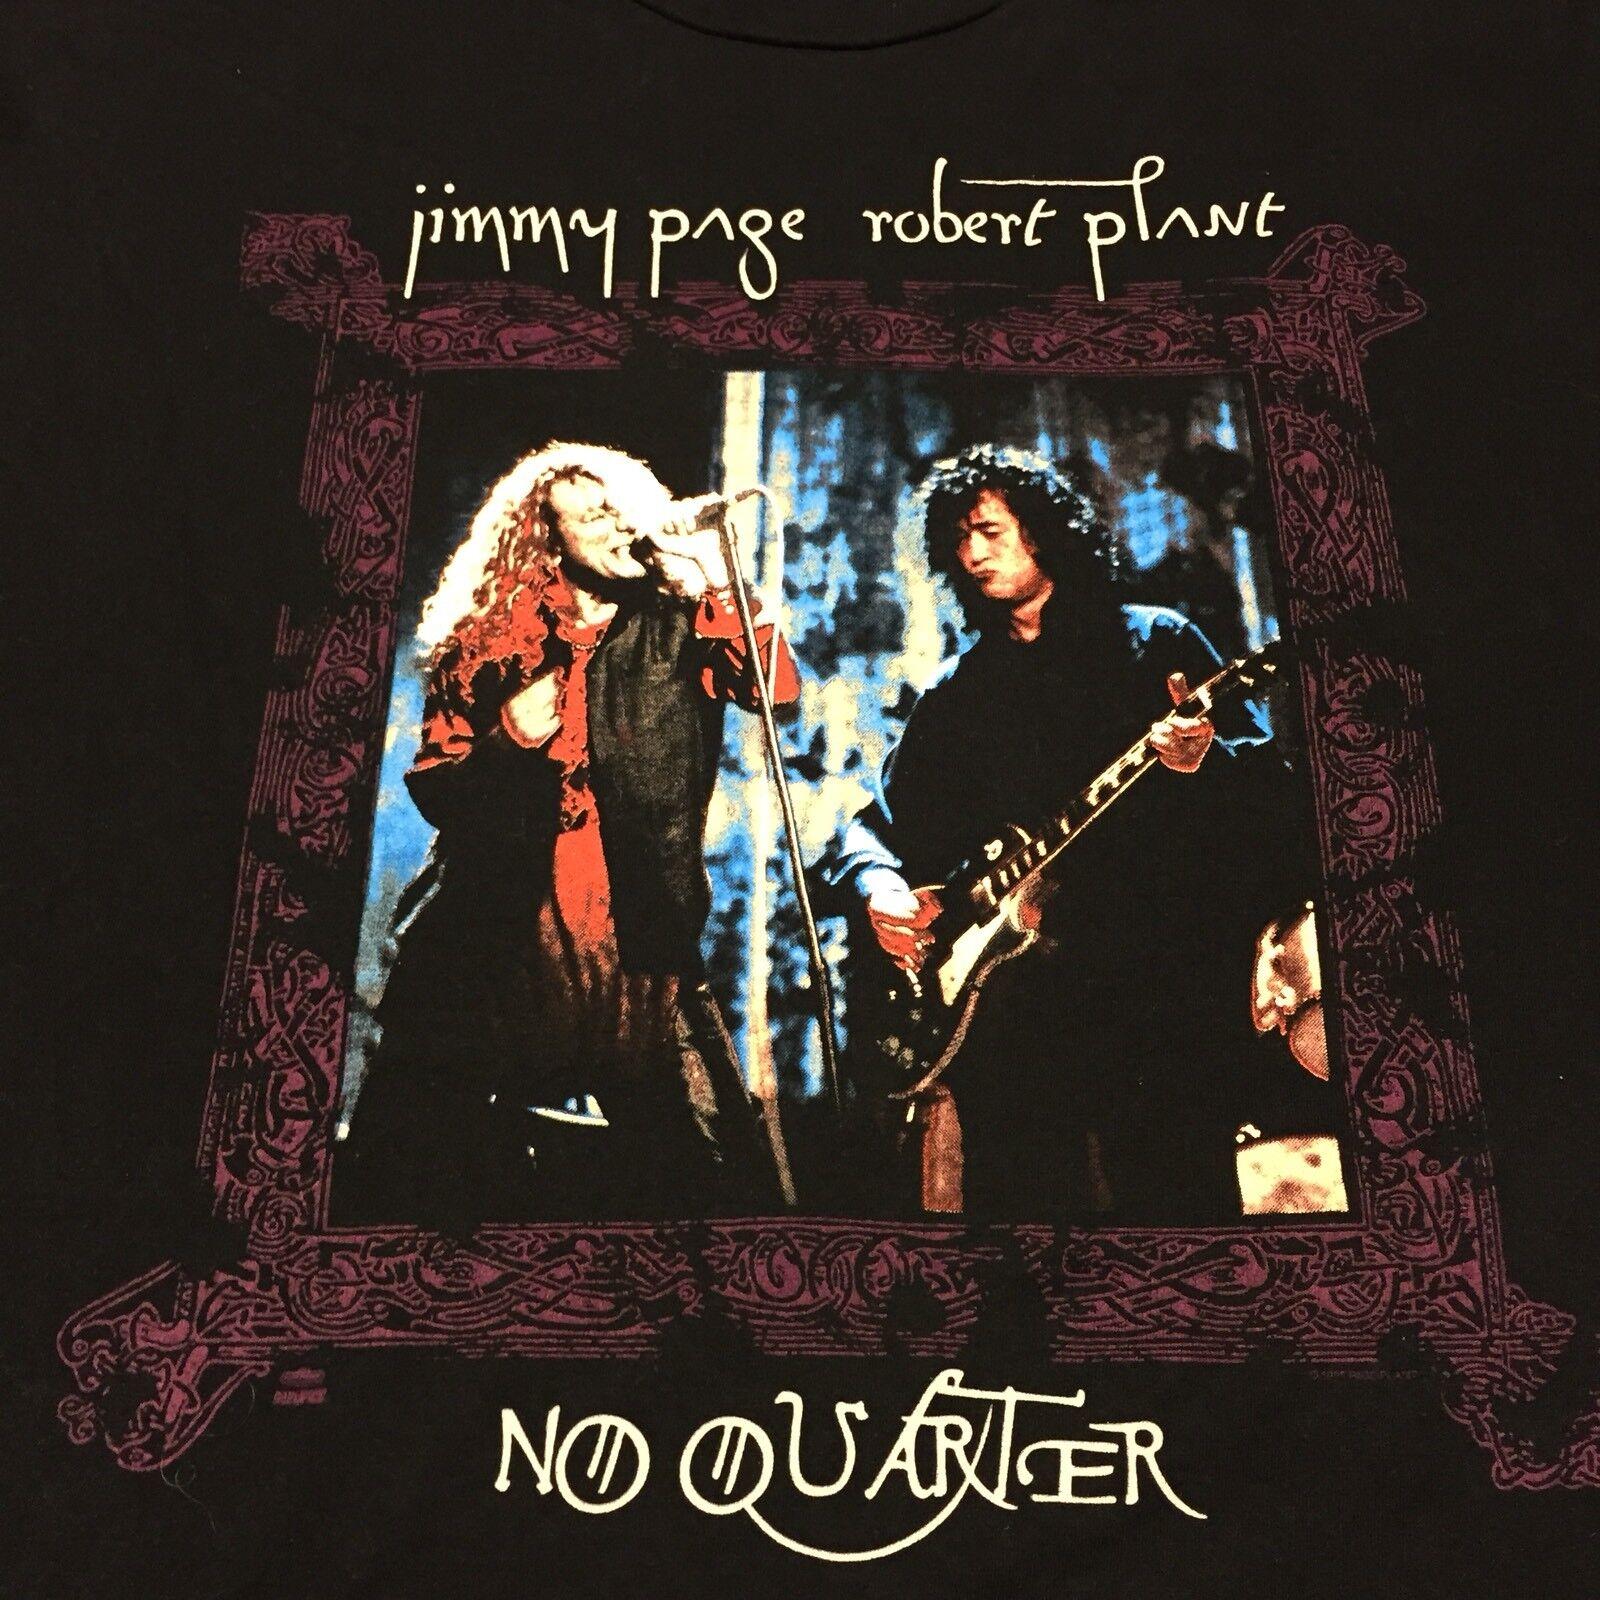 Vintage 1995 Jimmy Page Robert Plant Concert T-shirt 2-sided Tour Led Zeppelin